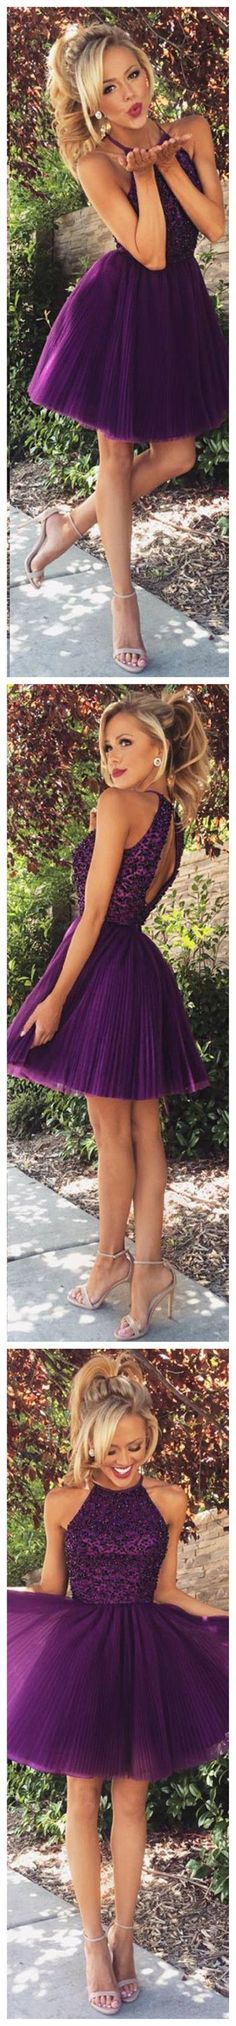 Fashion Purple High Neck Open Back Homecoming Dress,Short Prom Dresses on Luulla